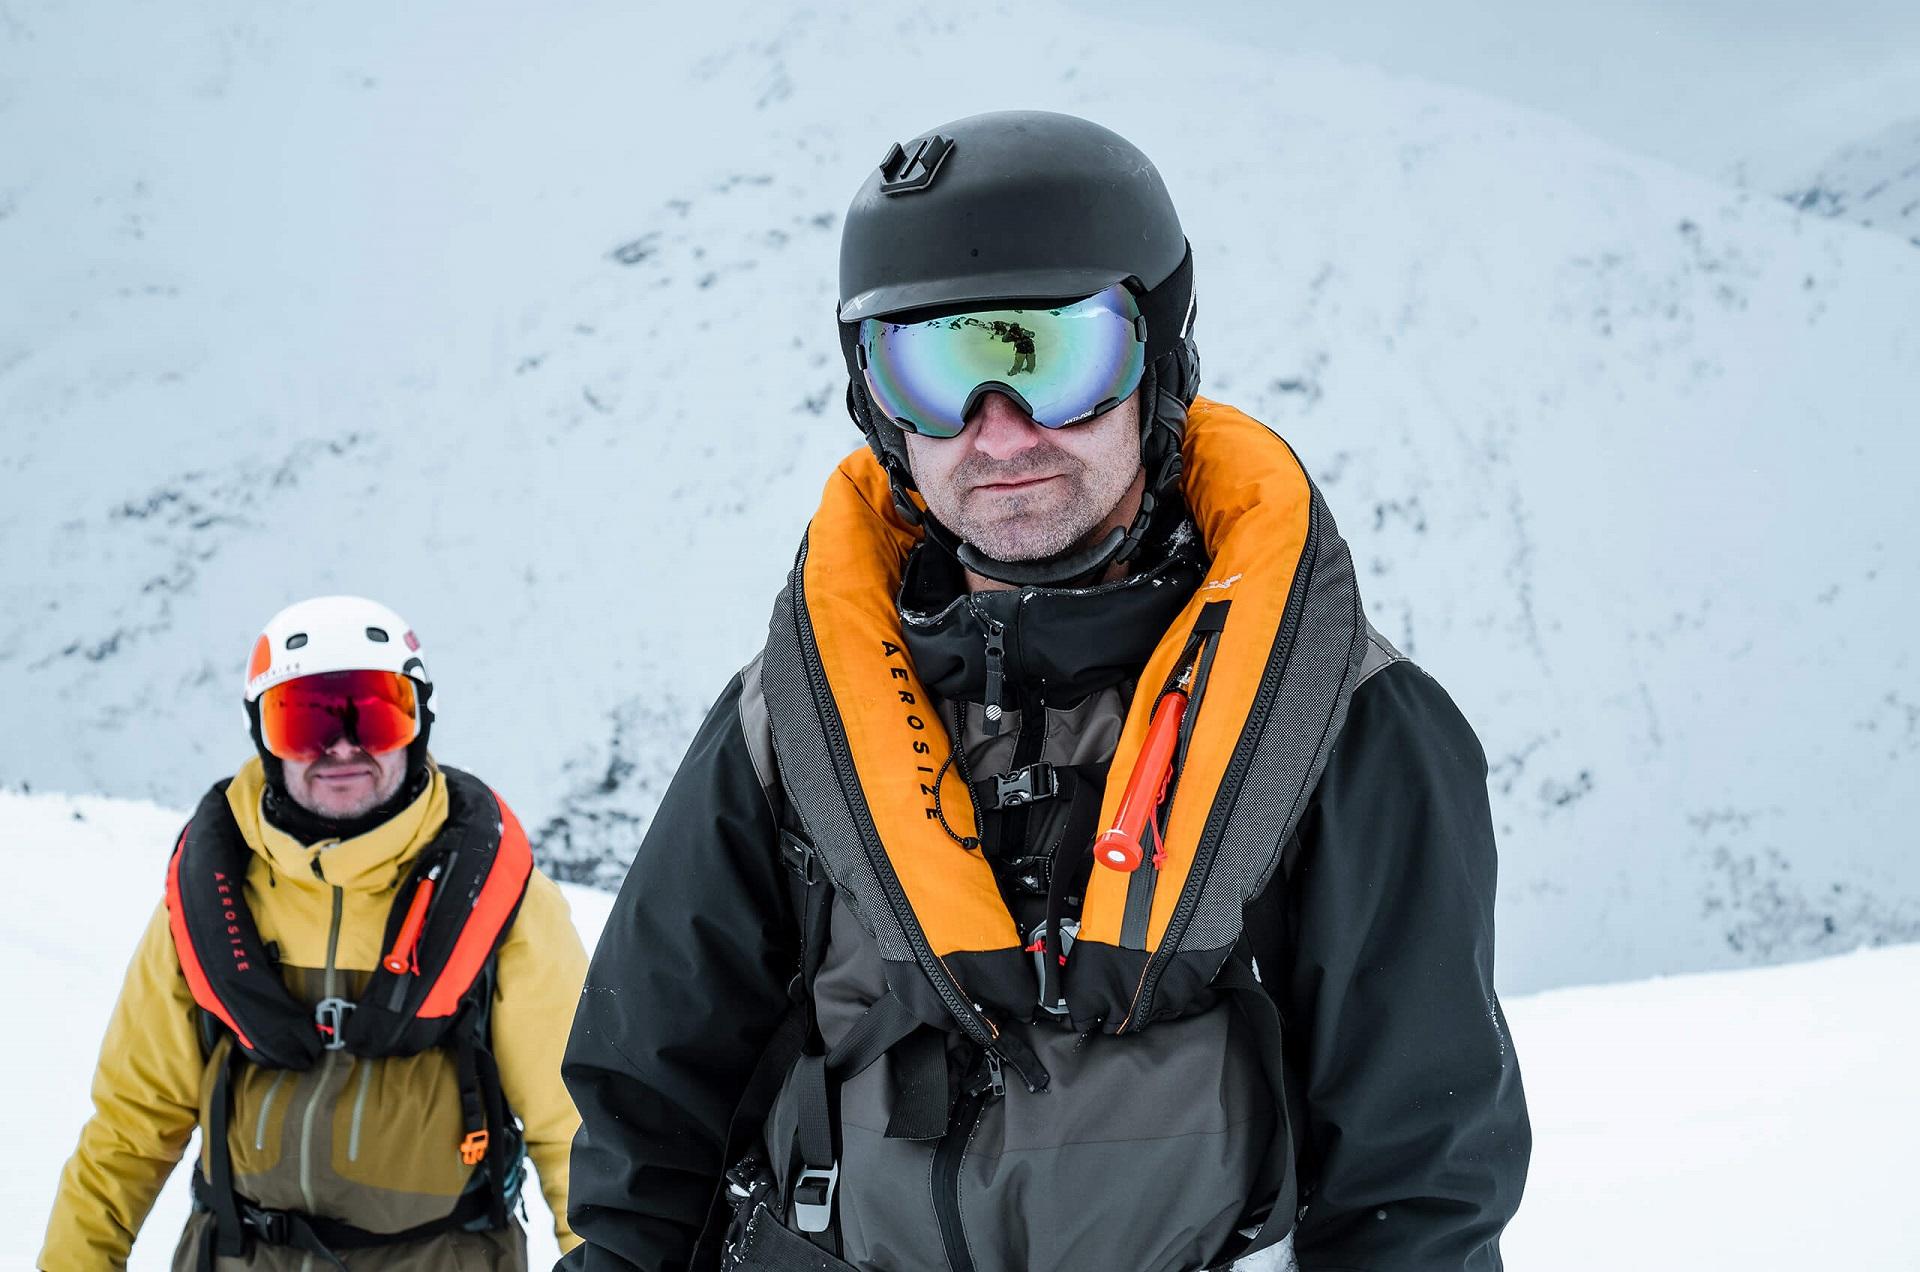 Team members: Wojciech Wieczorek (left) and Wojciech Surdy (front) in AEROSIZE avalanche vests, in winter, in the mountains